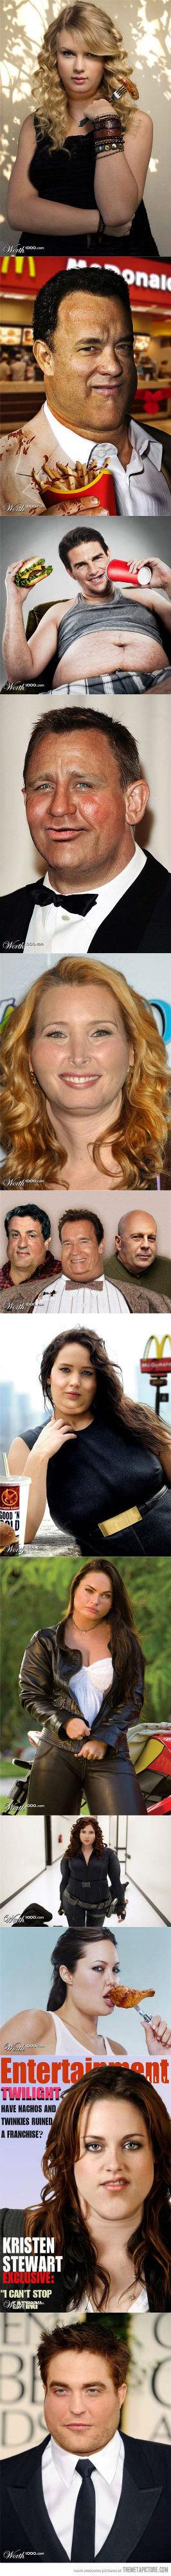 Fat Celebrity's. Not OC. MINE IE TIE! Hill I THEME? KRISTEN STEWART I STEP. >fat celebrity's Fat celebrity